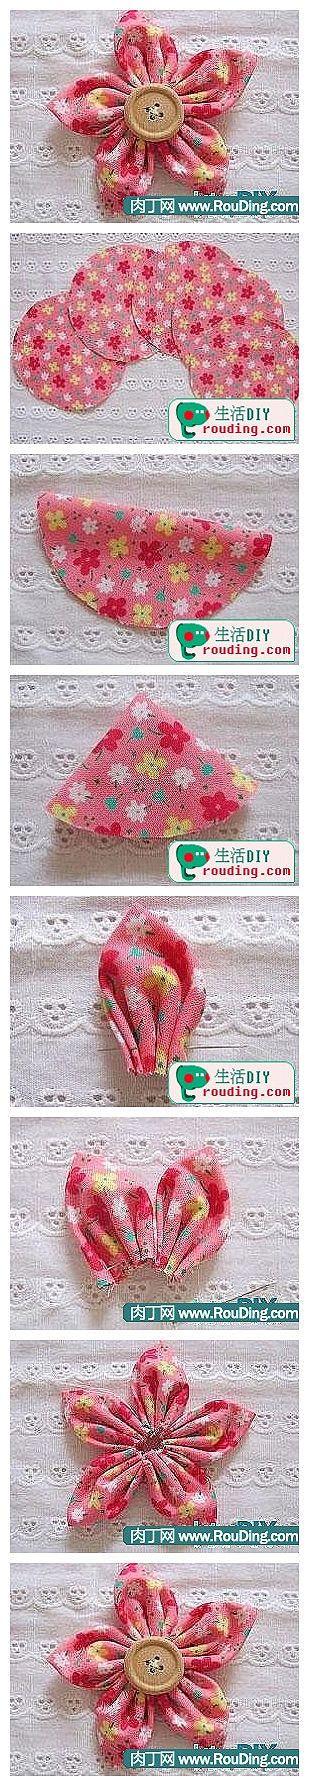 fabric flower tutorial. A g